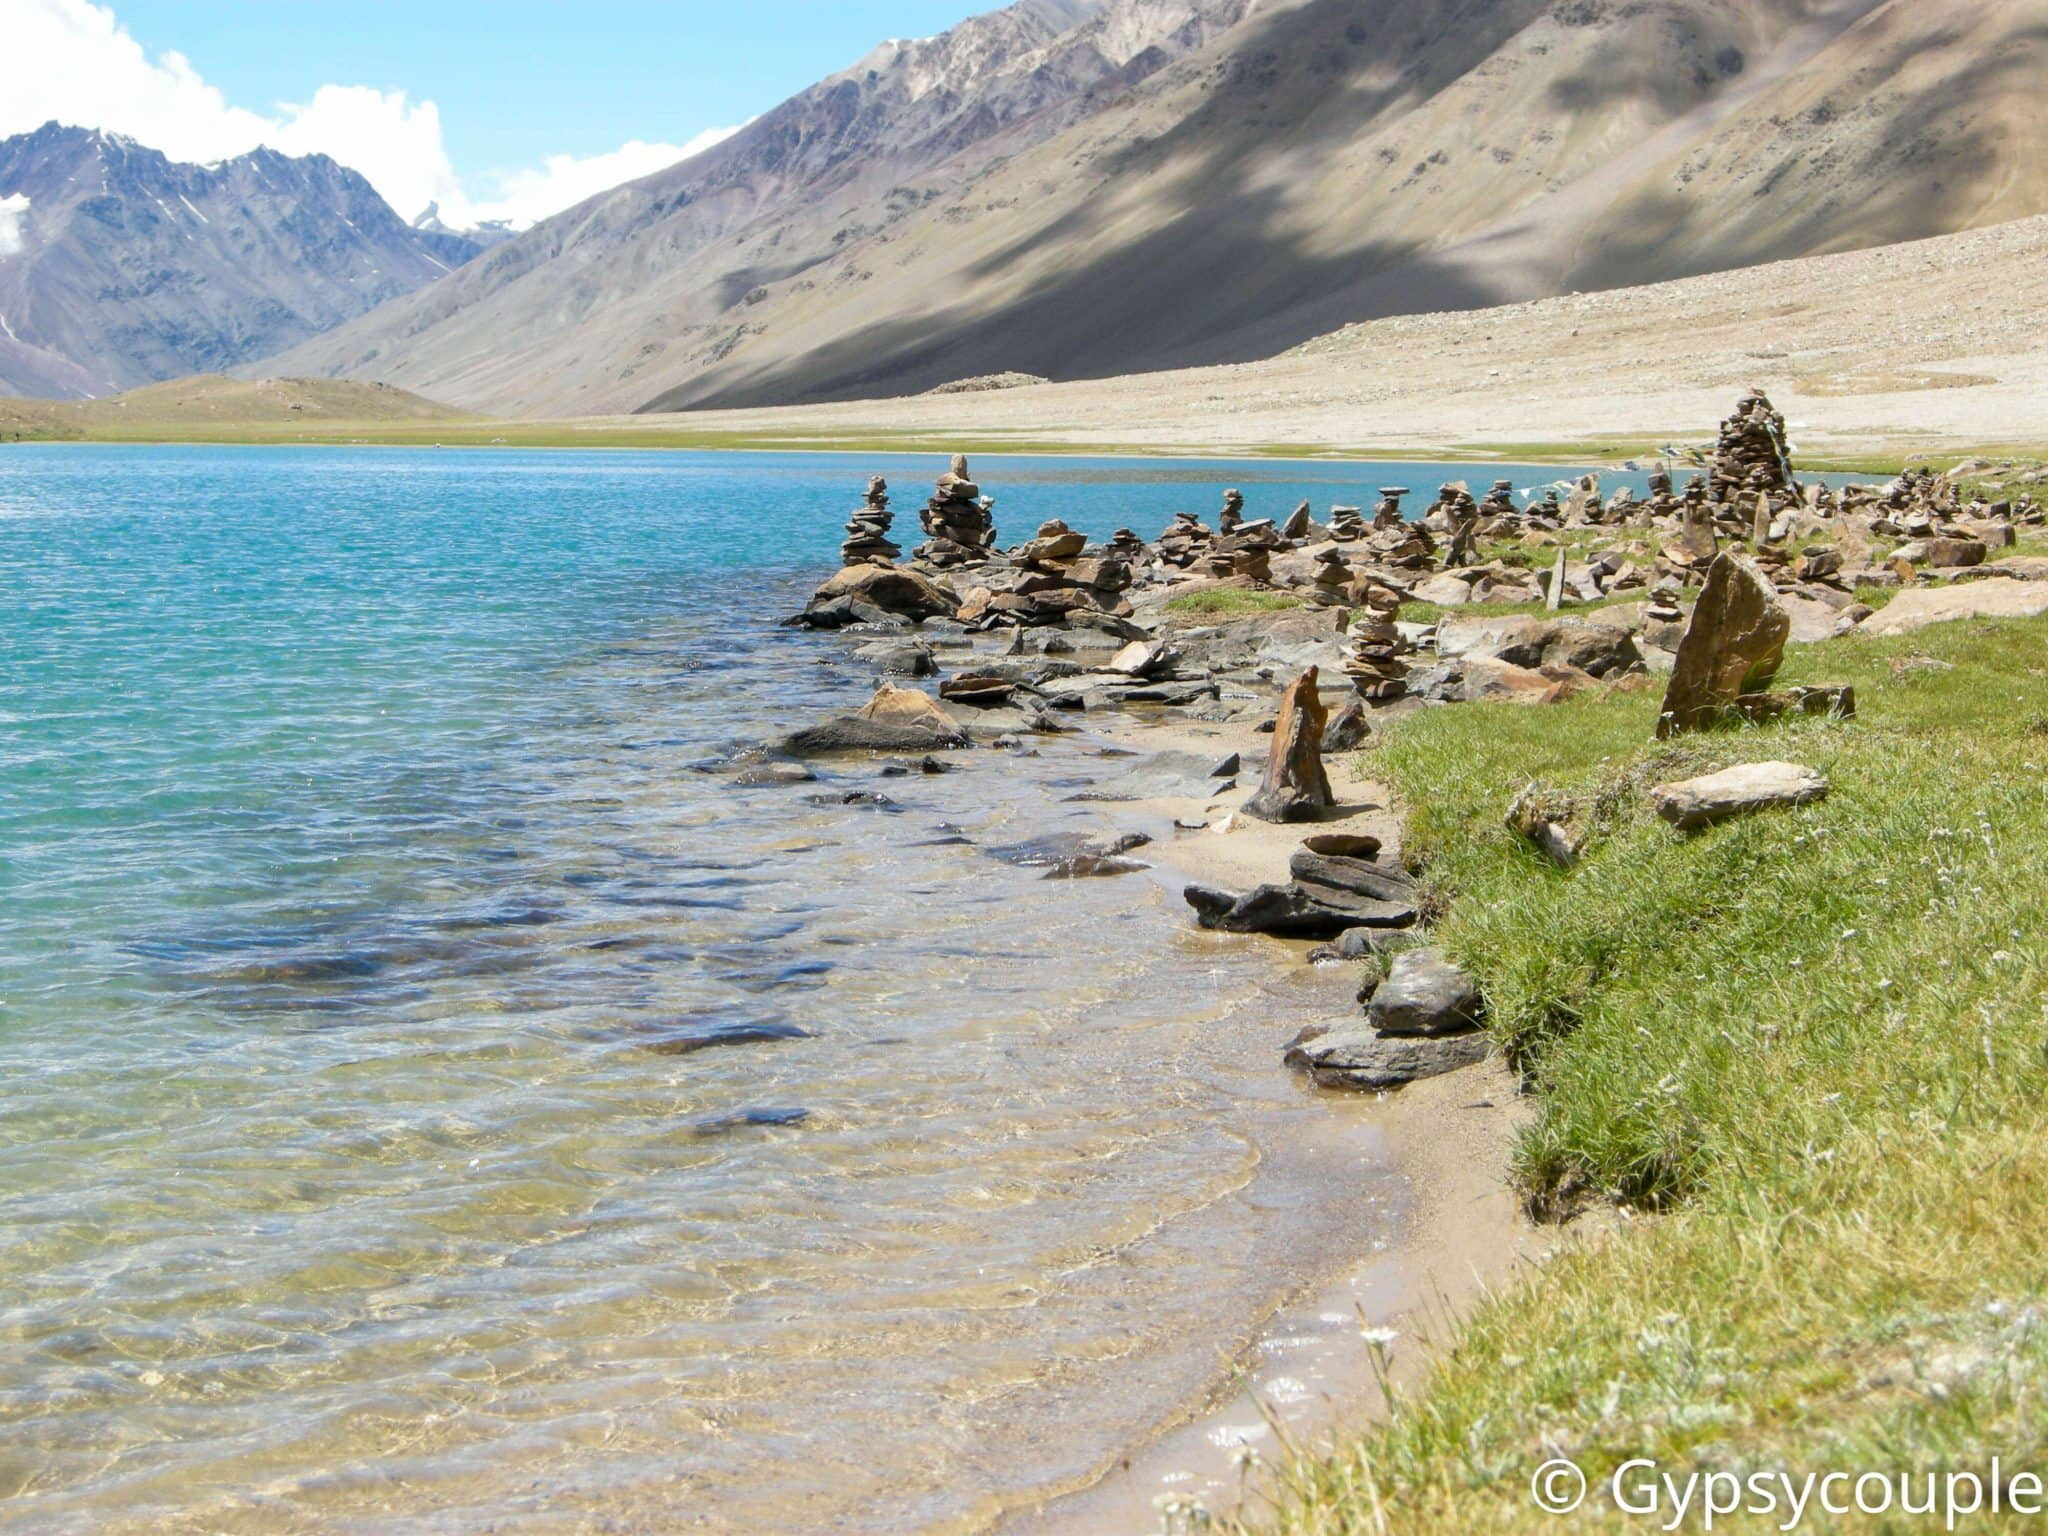 Chandratal Lake - Religious stone pillars